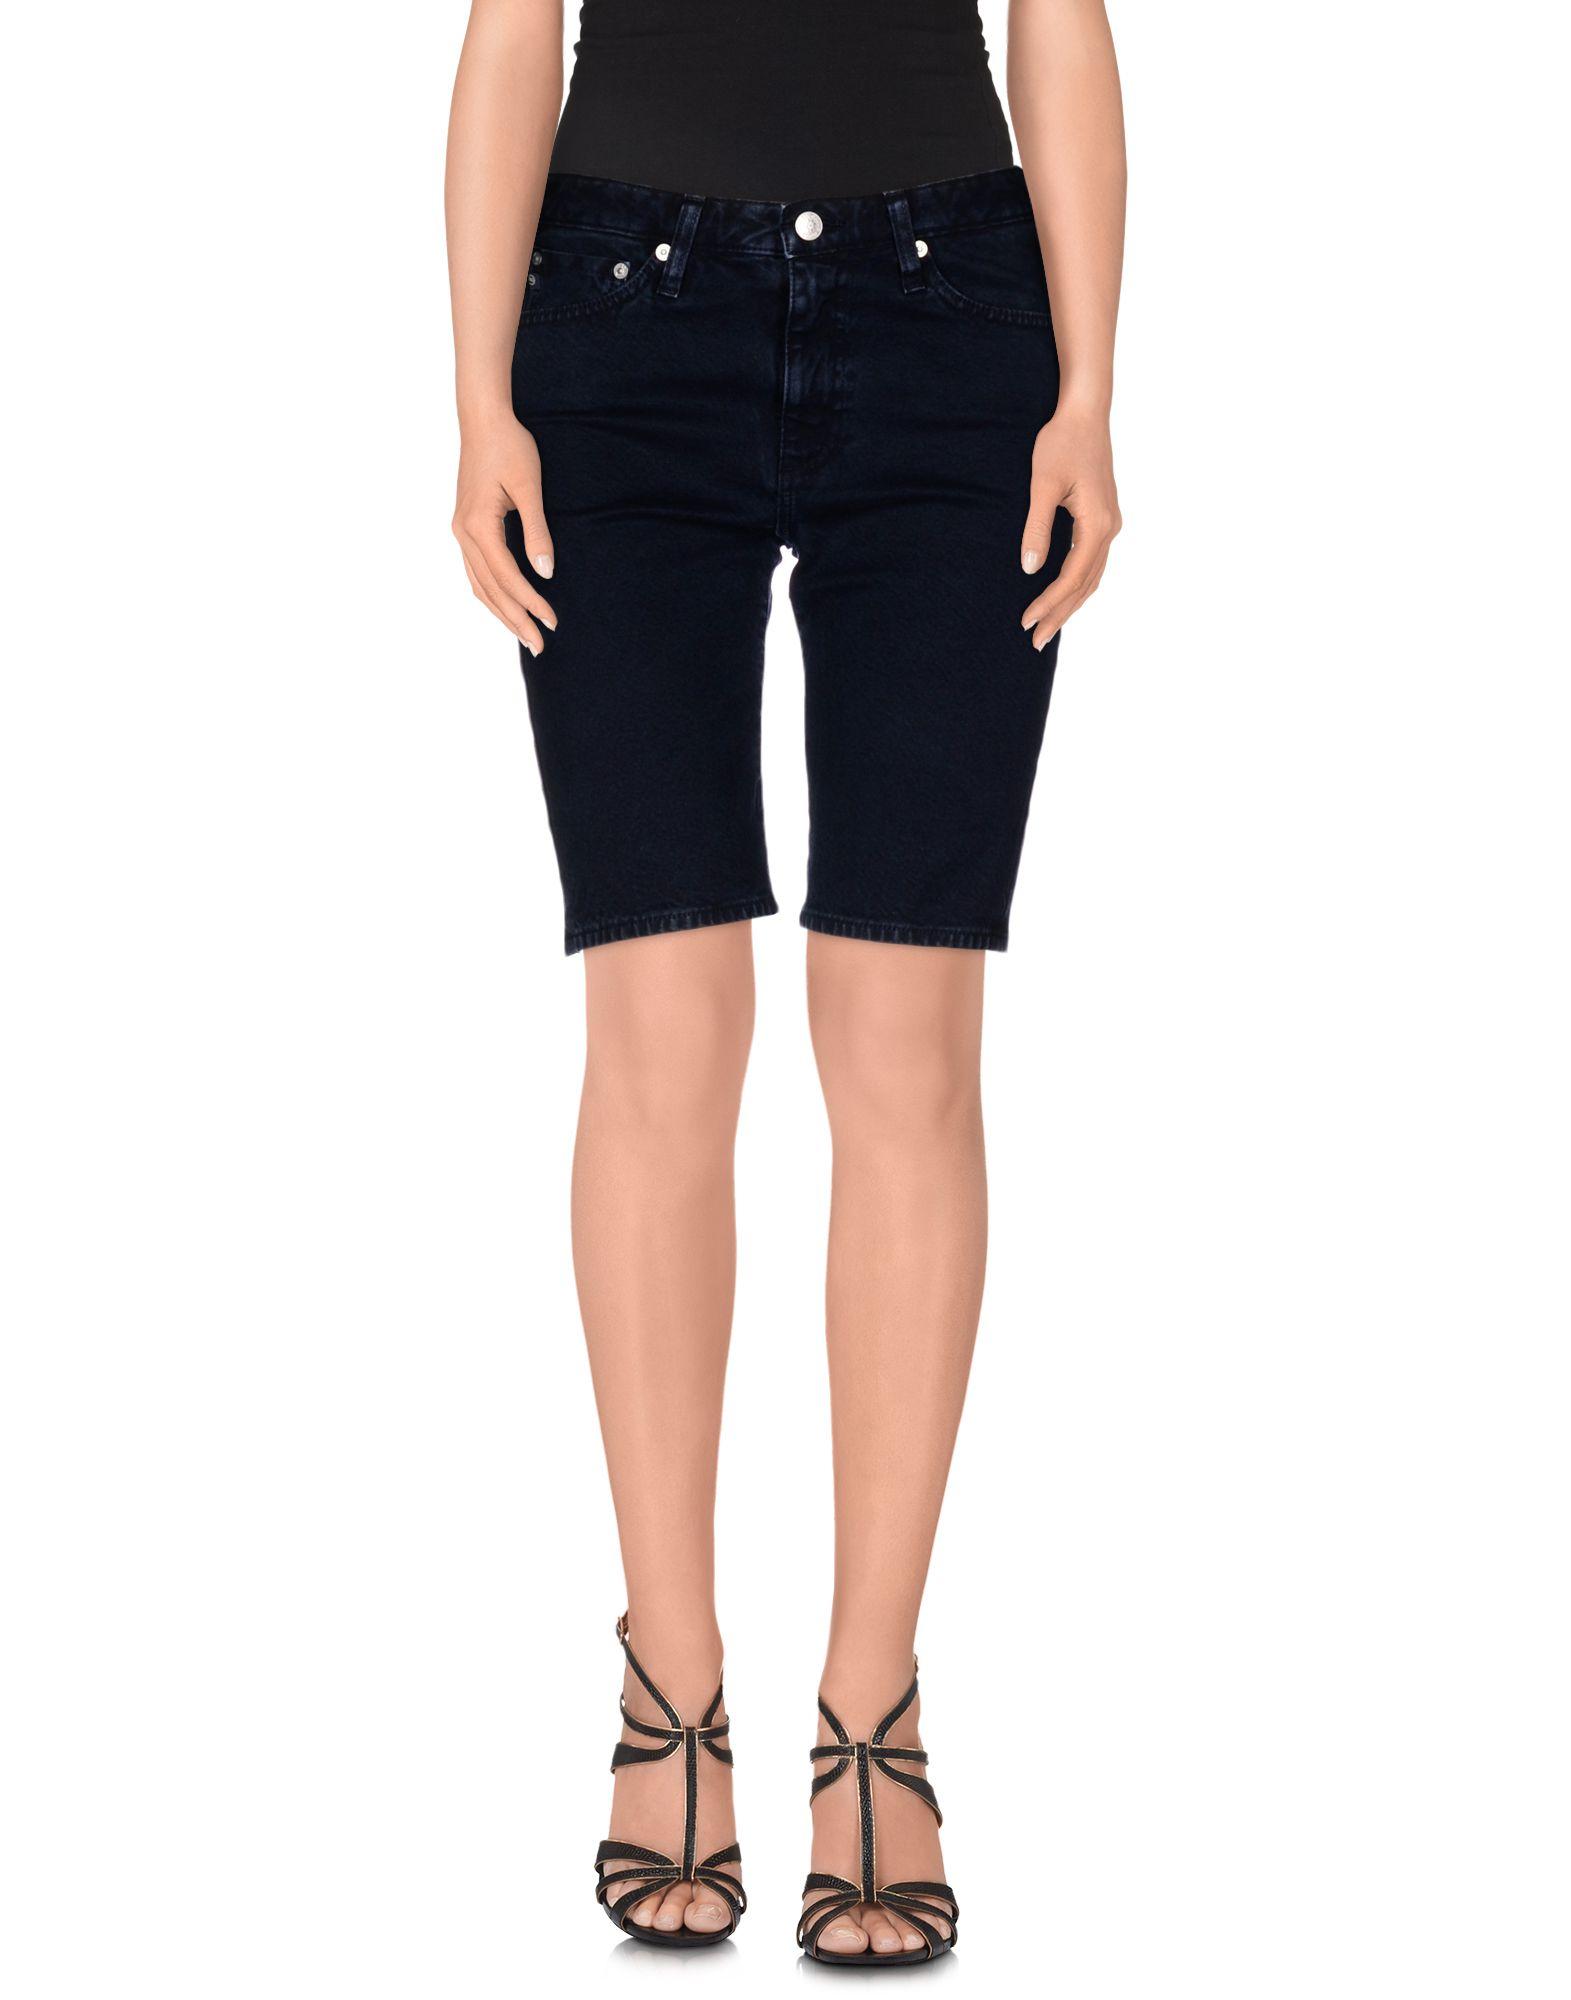 ALEXA CHUNG for AG Jeans Джинсовые бермуды